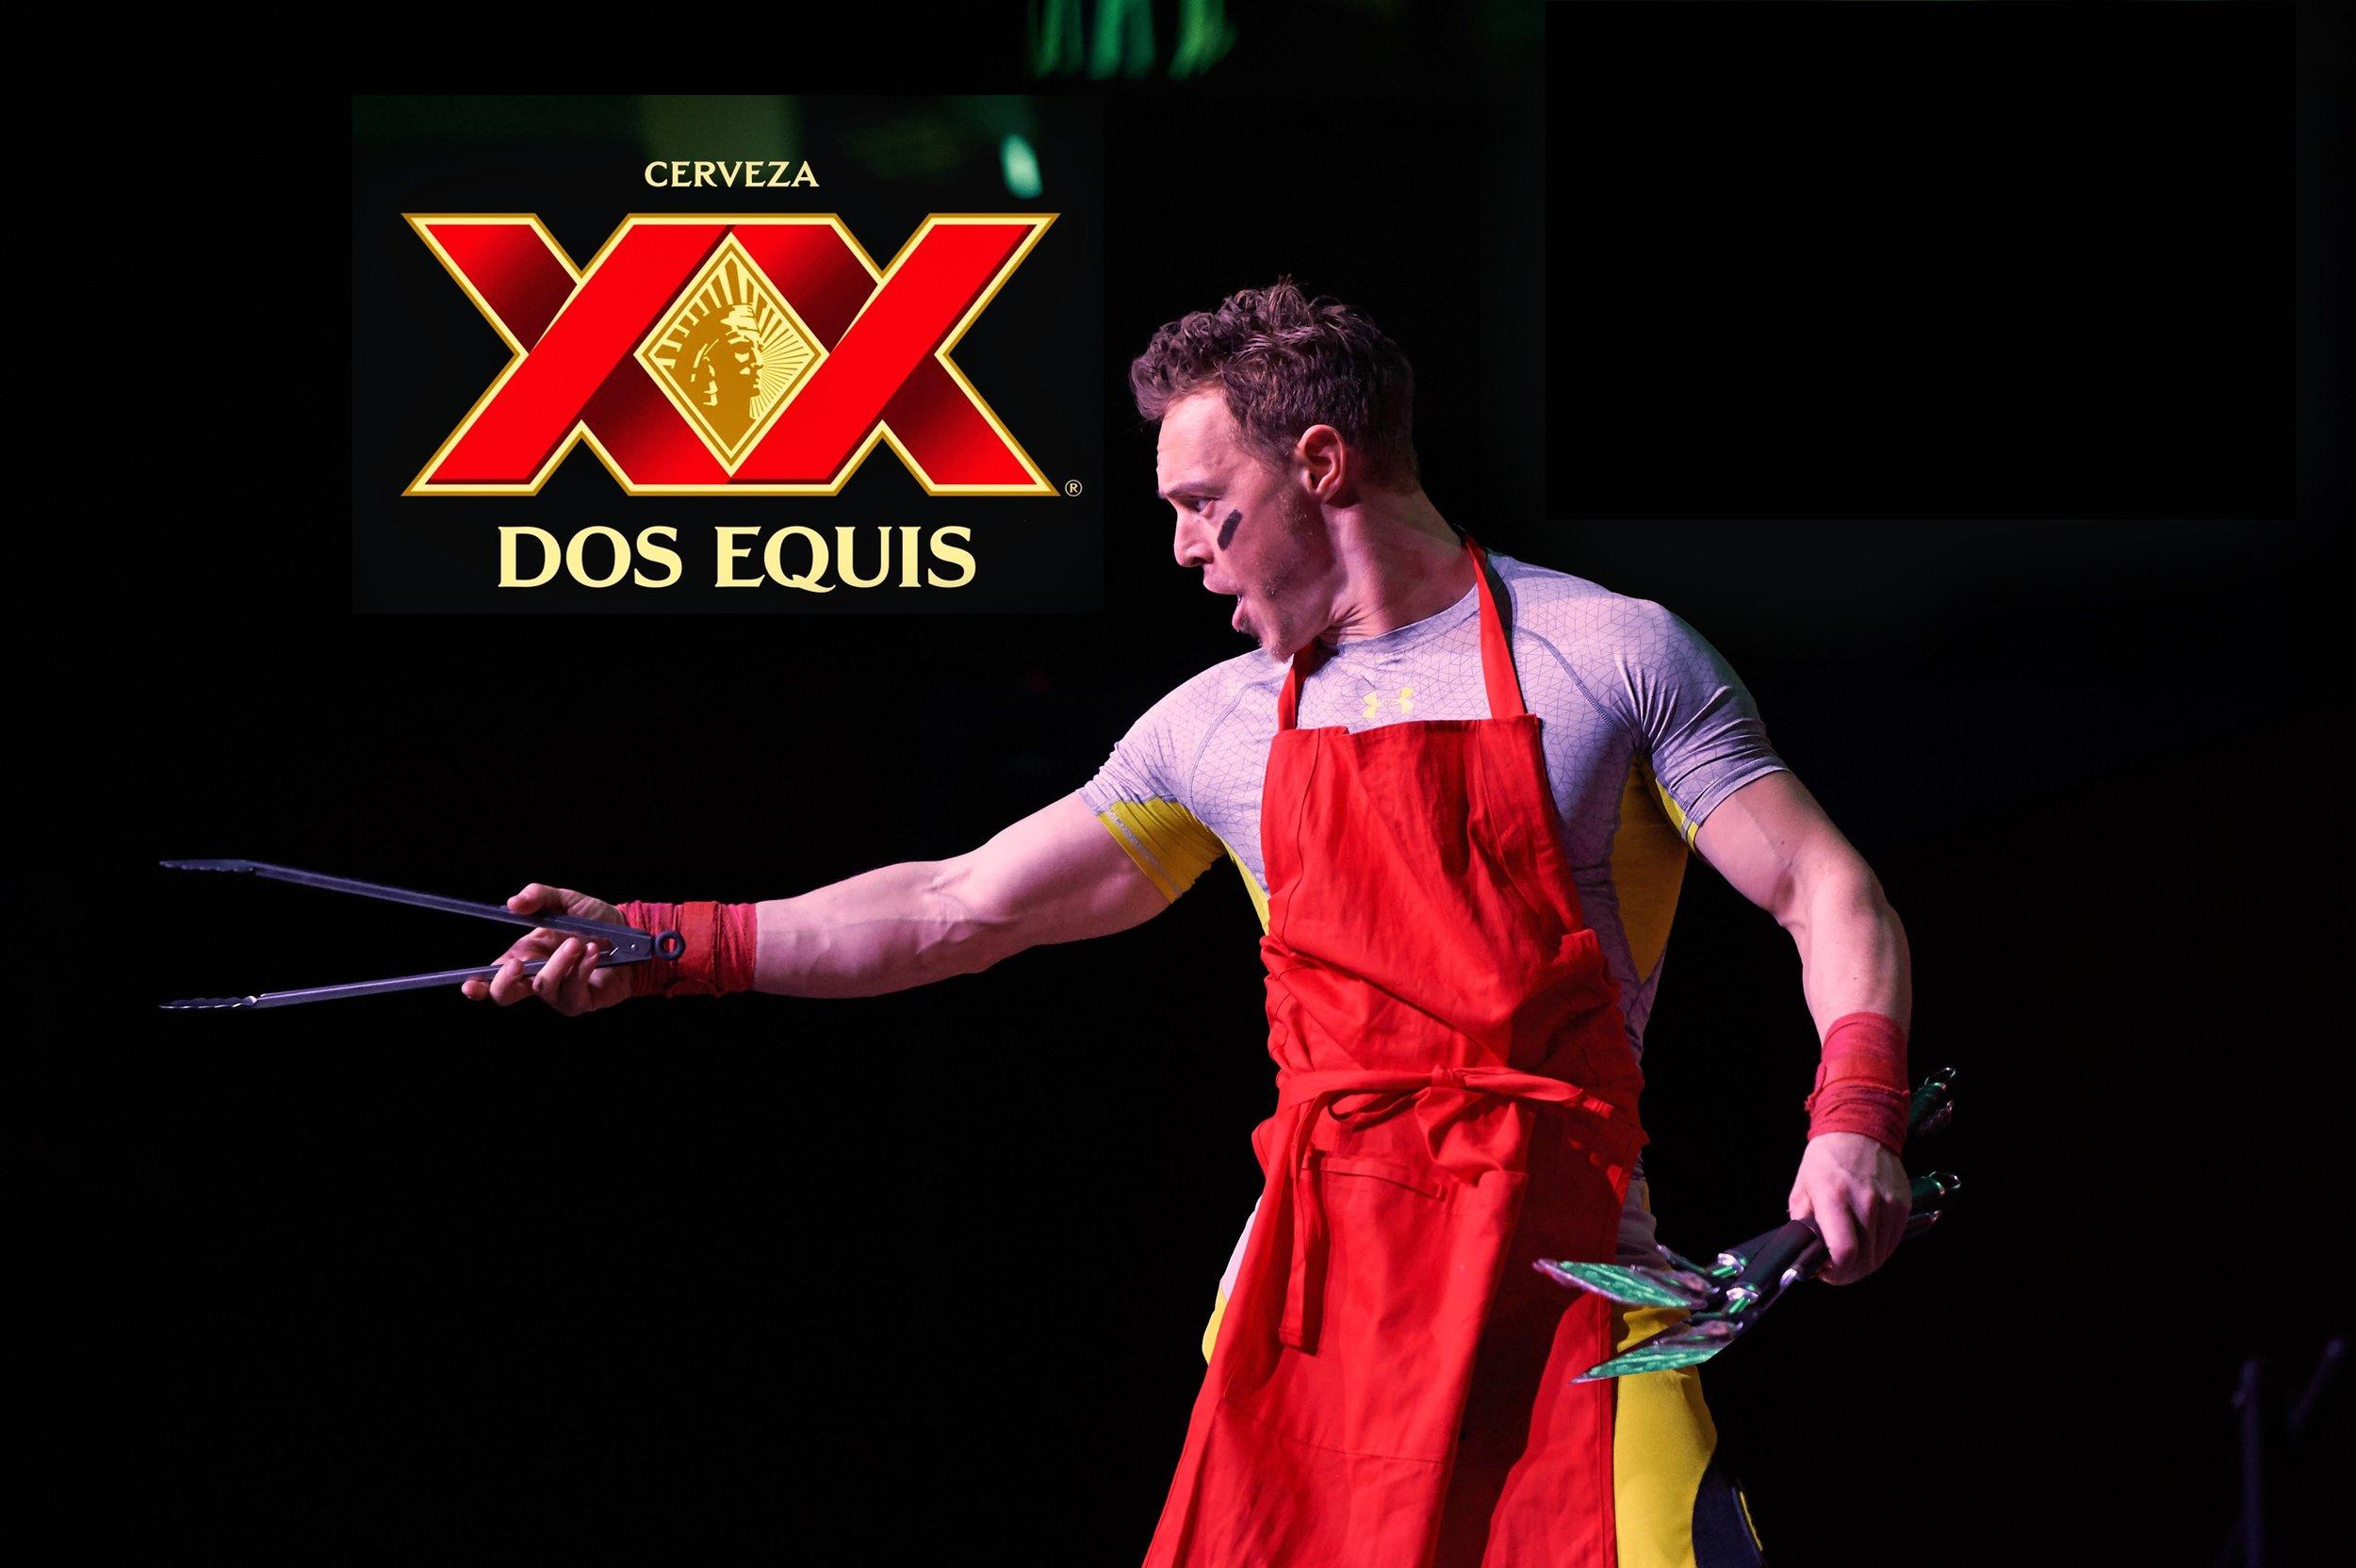 Dos Equis - Rocco - logo.jpg